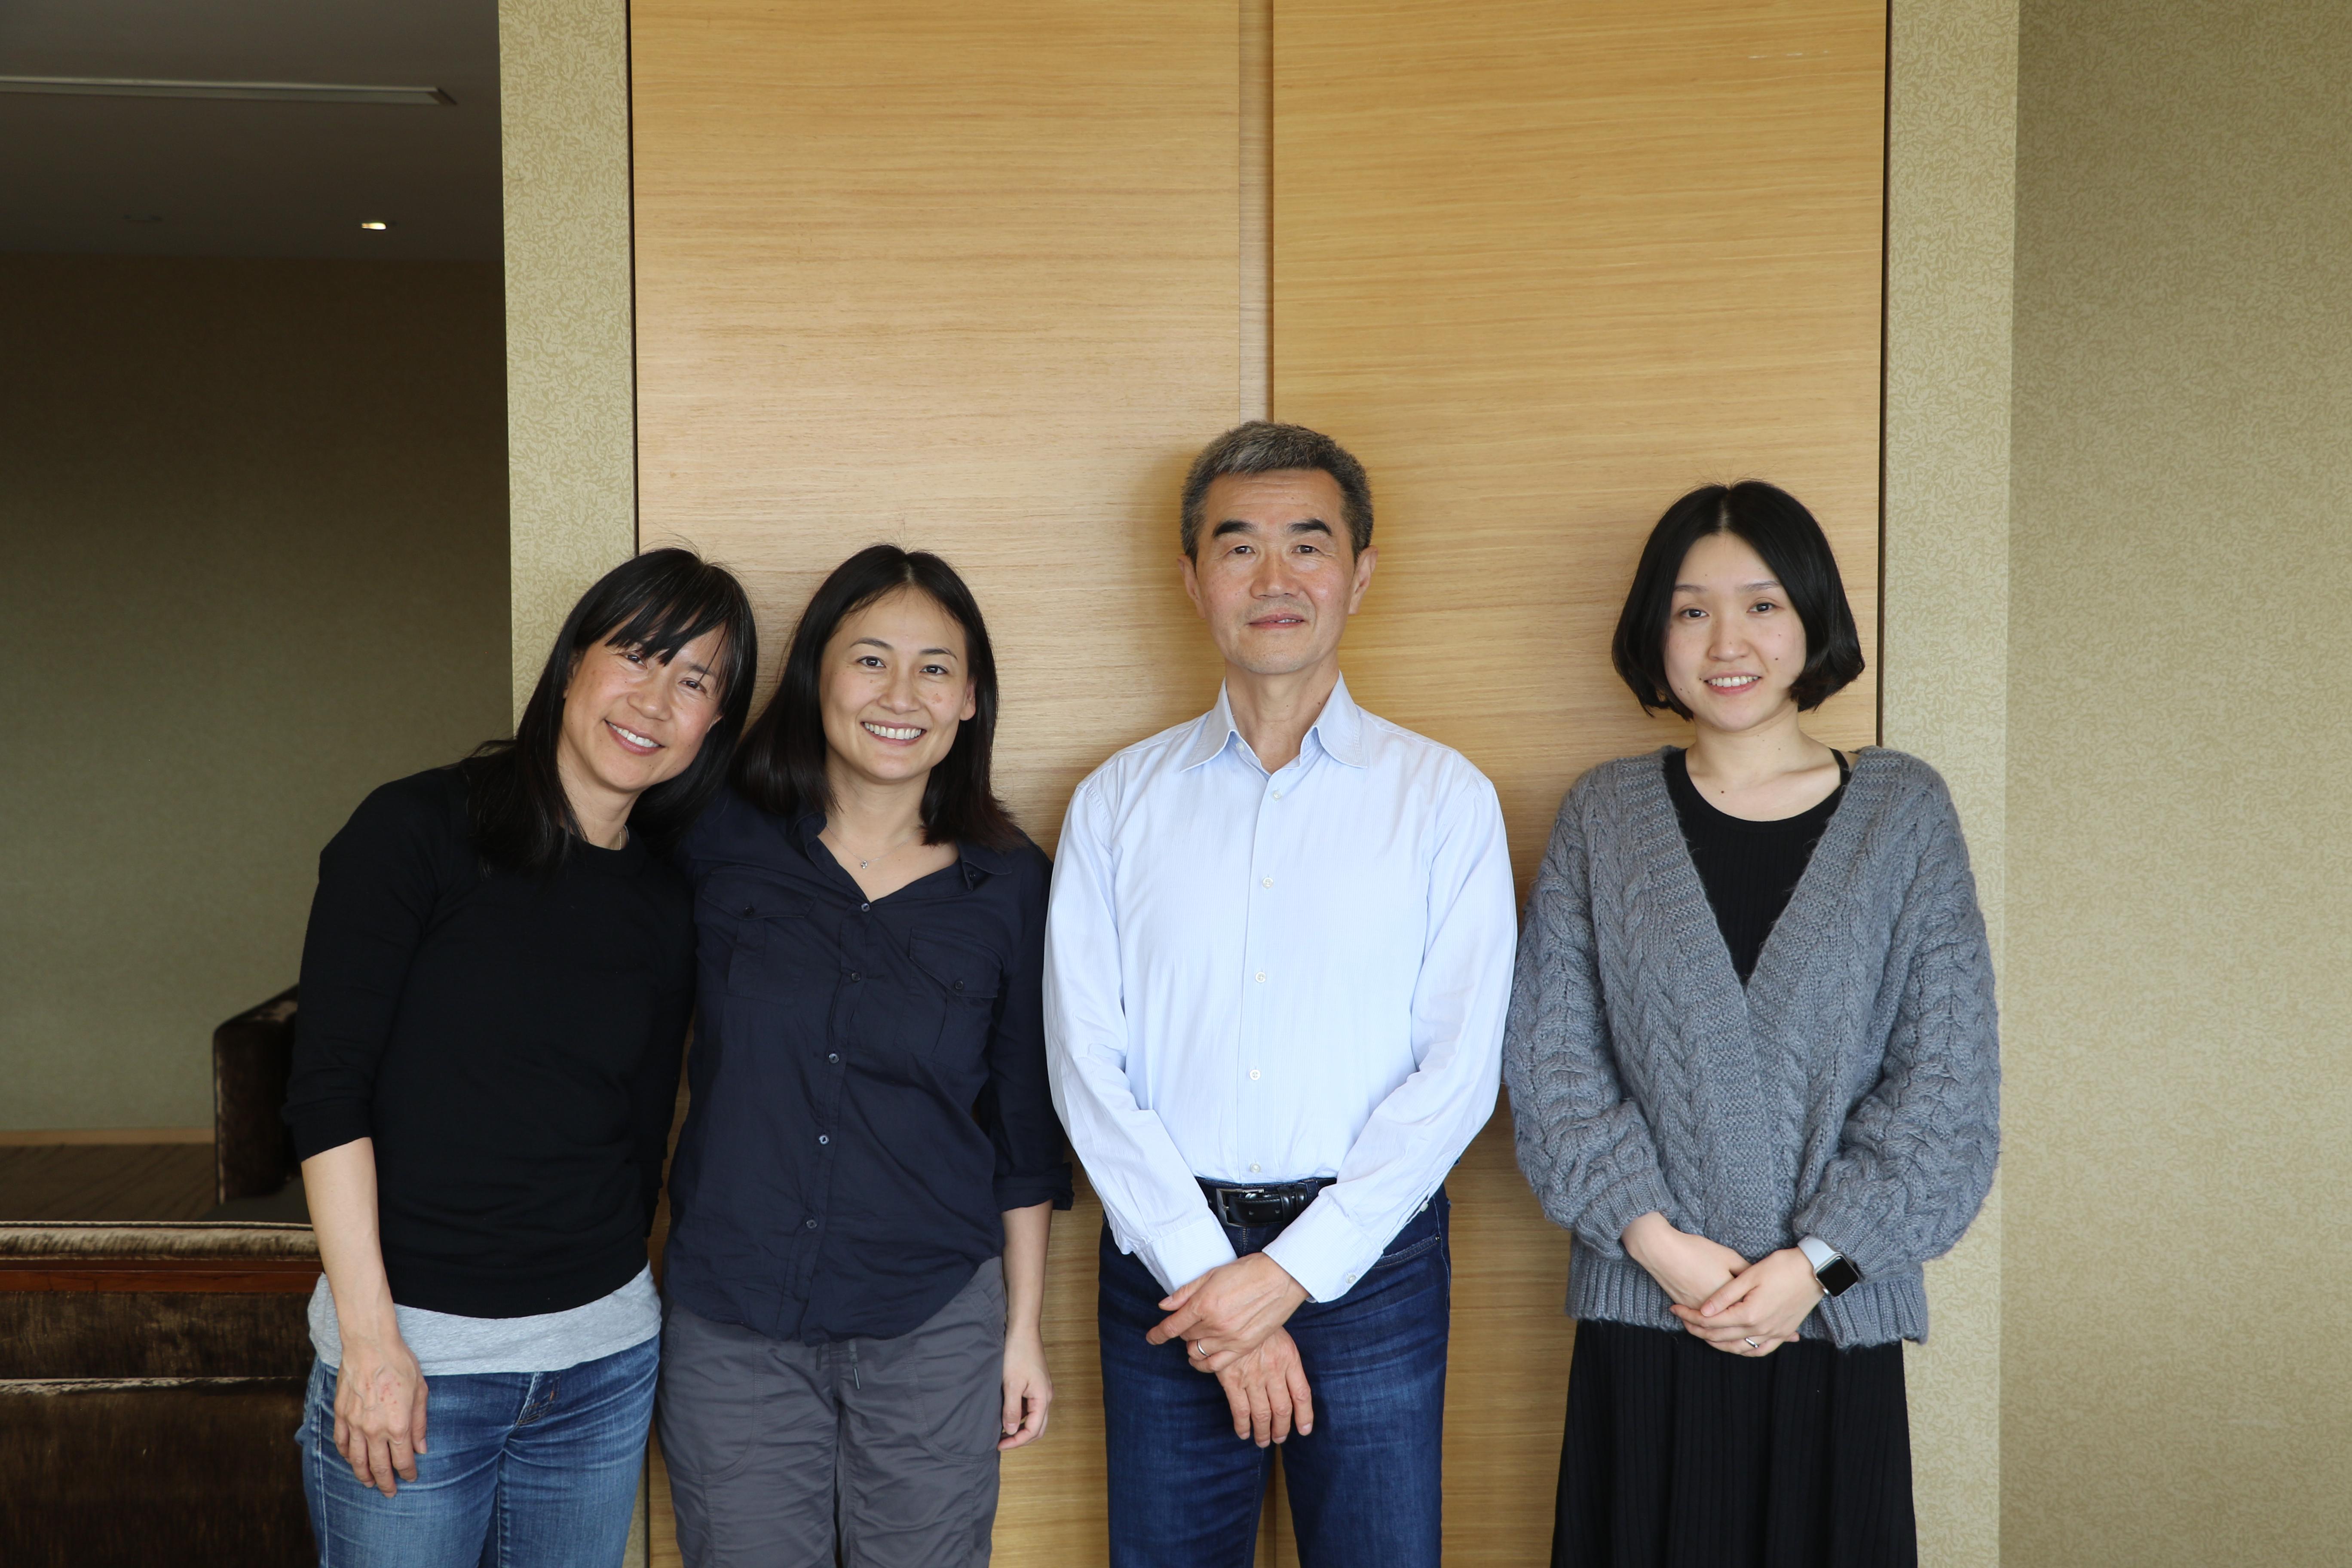 Co-conveners Teresa Kuan and Becky Hsu with research group member Yunxiang Yan and post-doctoral student Lynn Sun.